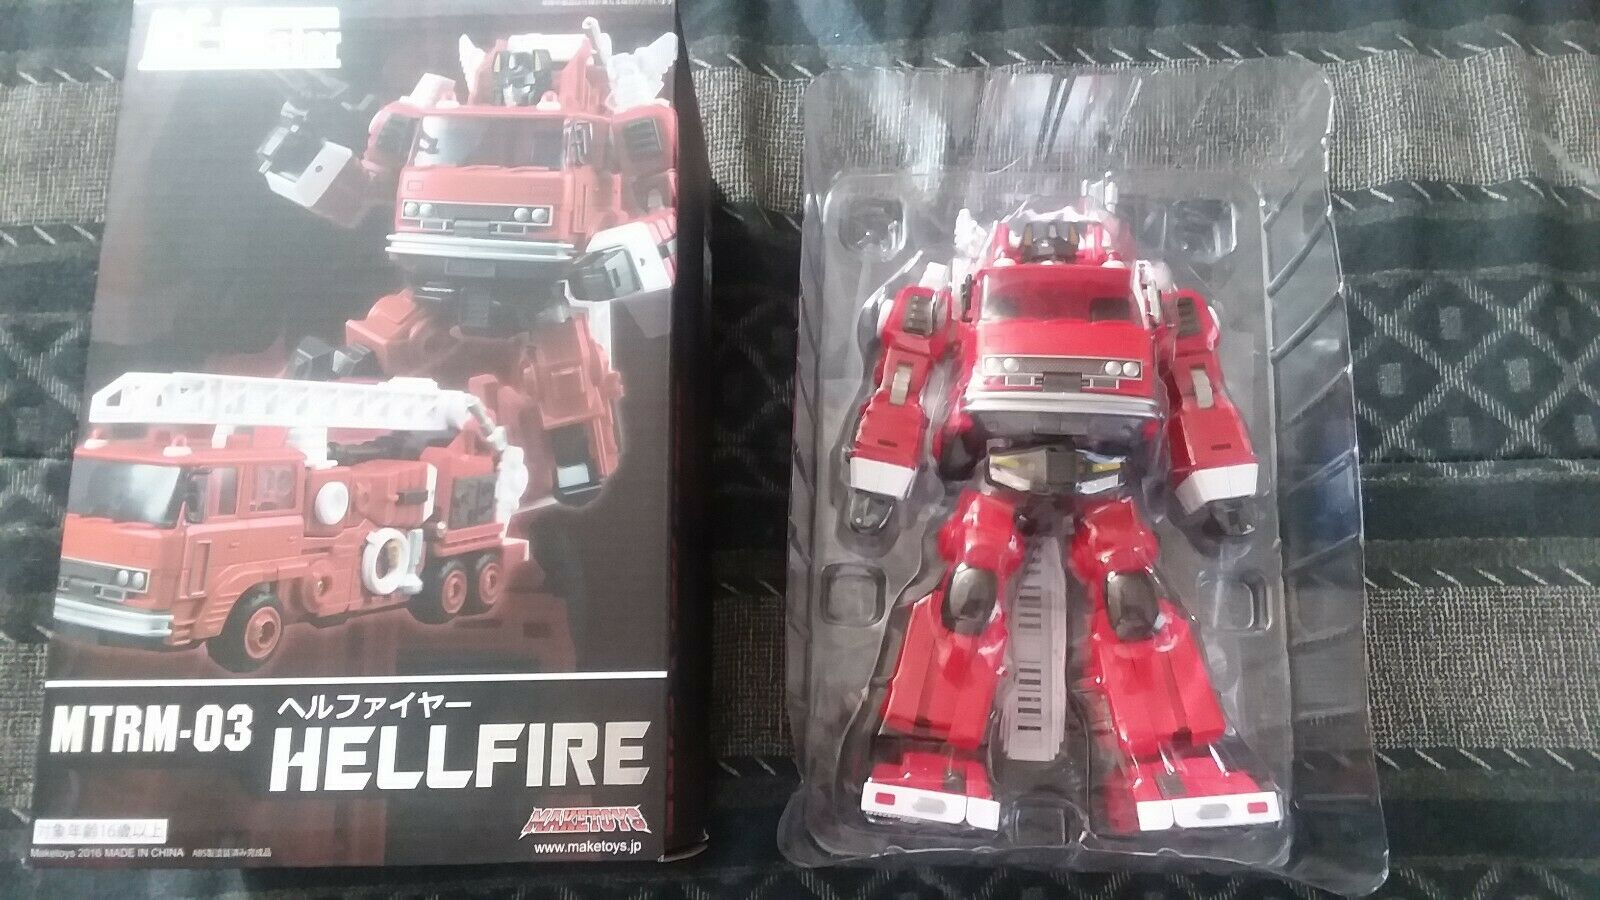 Transformers renderegiocattoli MTRM03 Hellfire 3rd Party Masterpiece Inferno